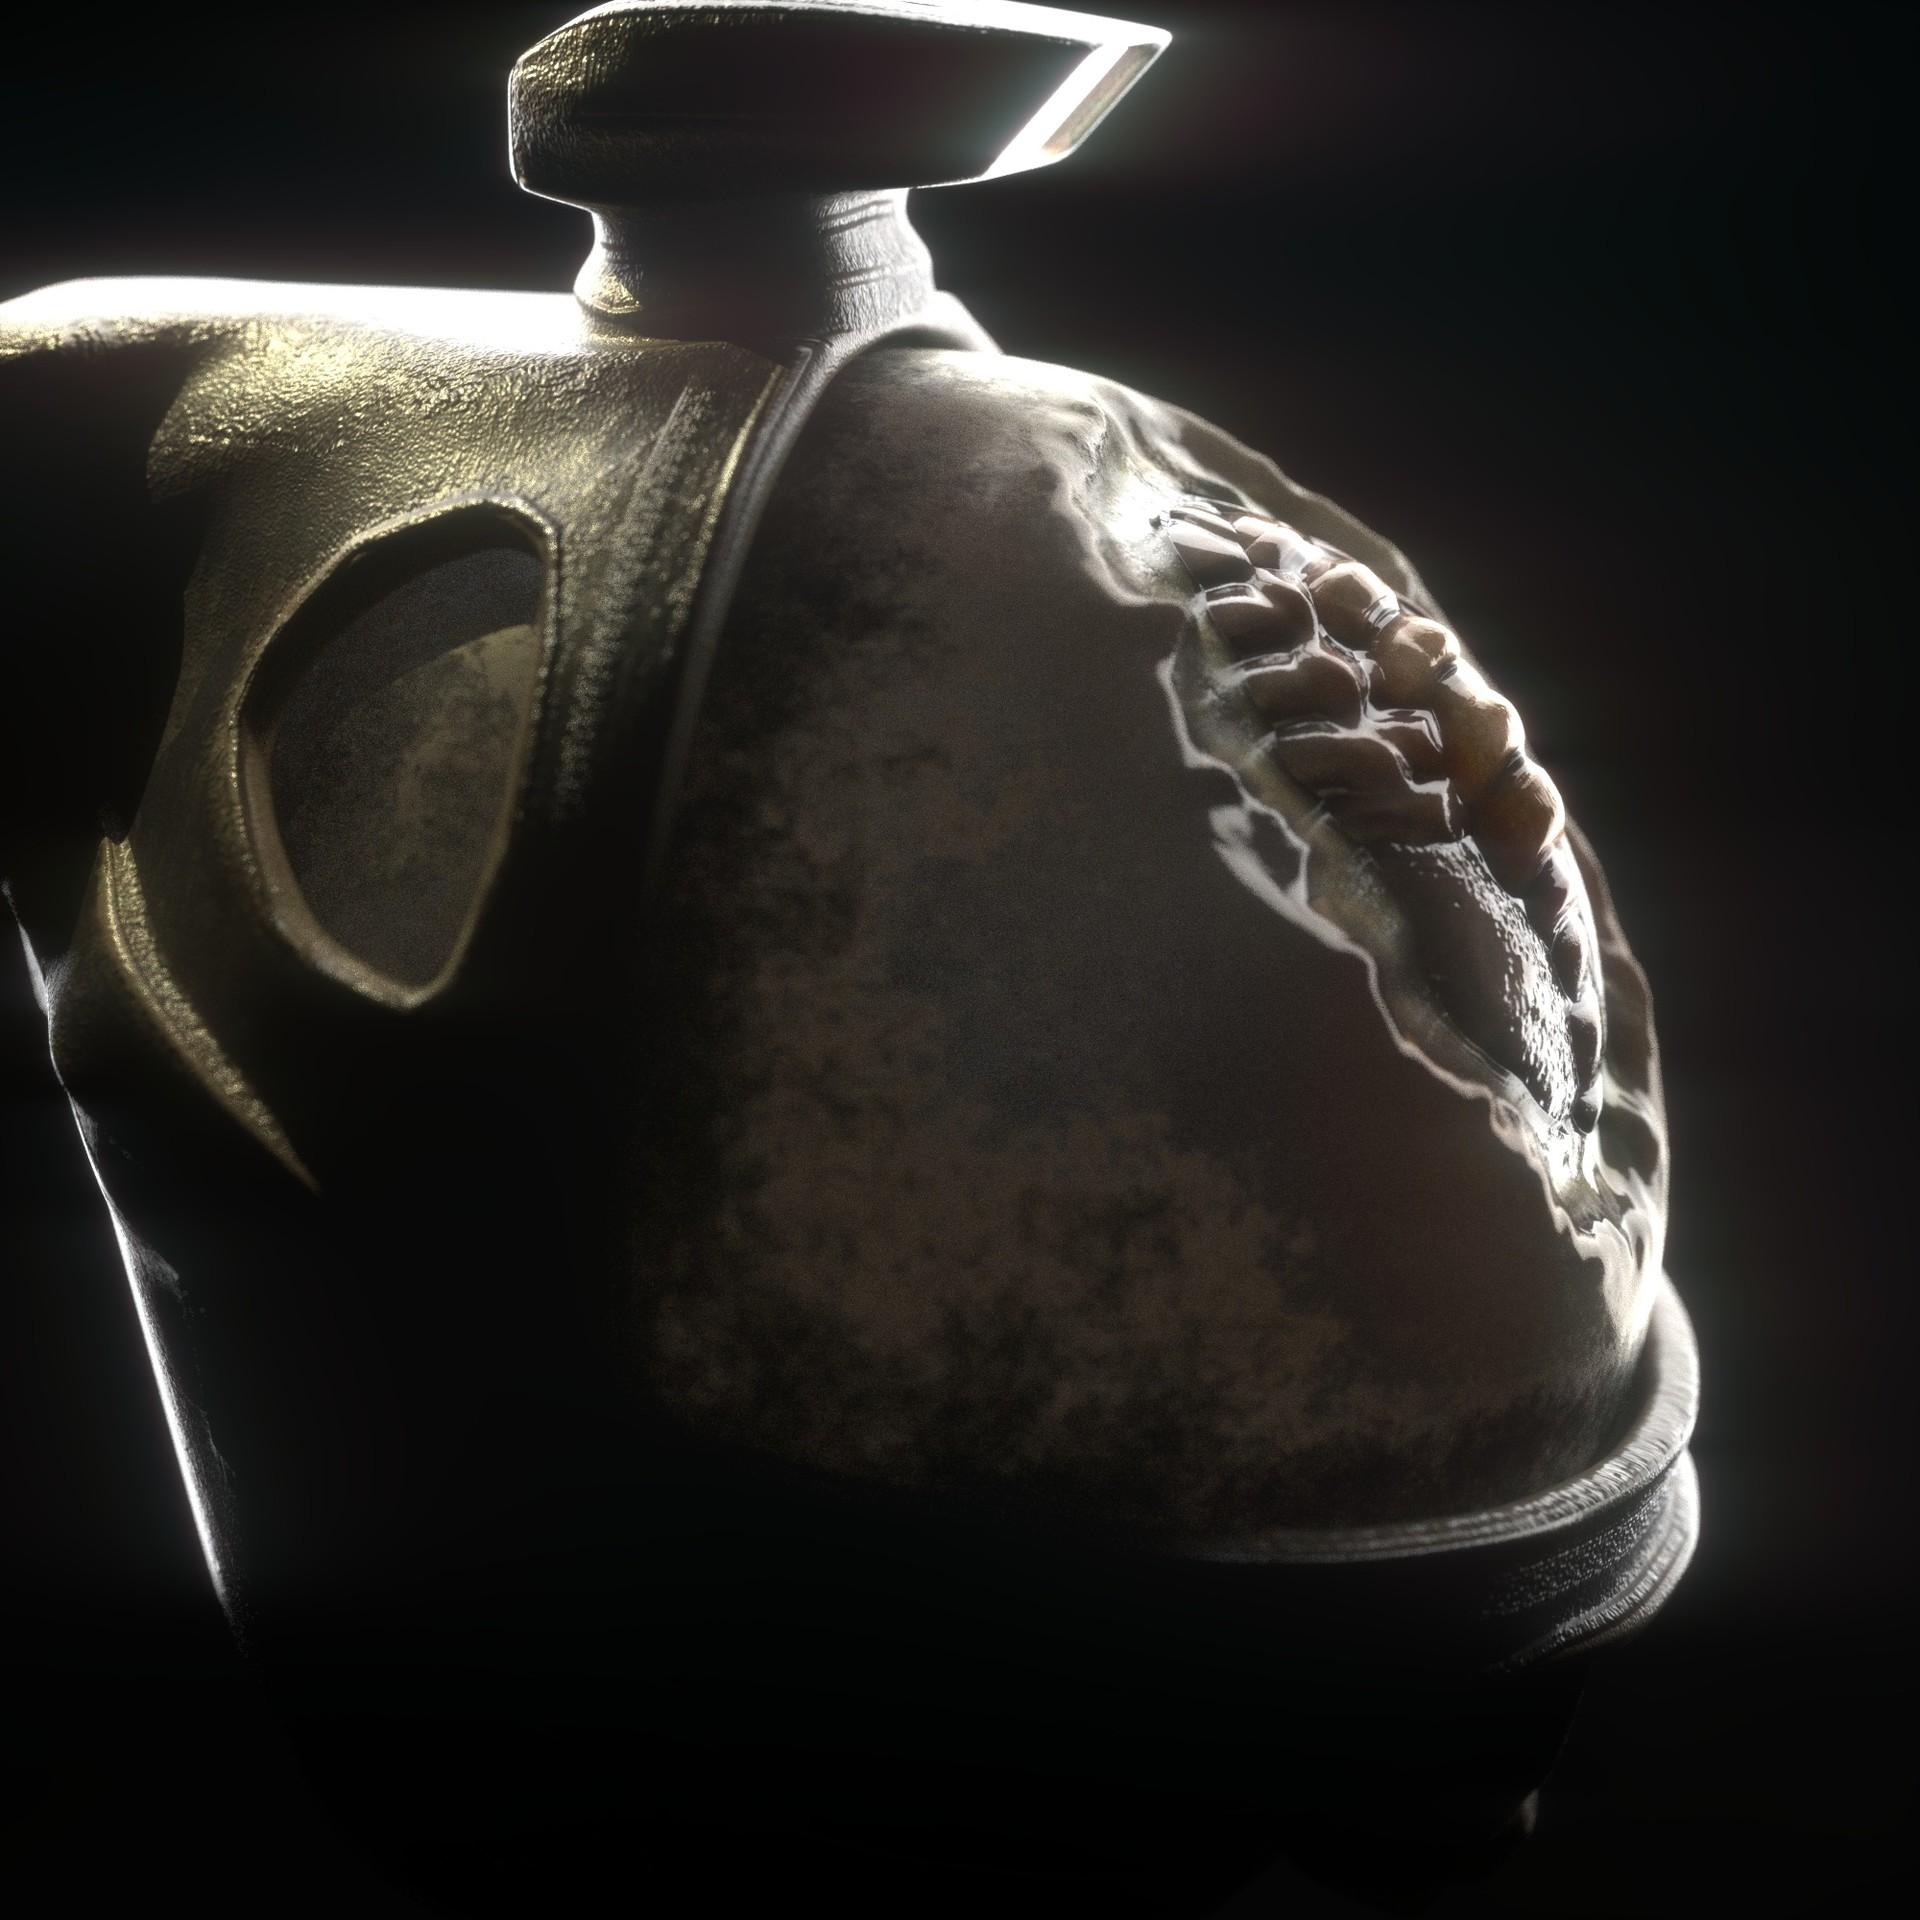 Cem tezcan helmet2